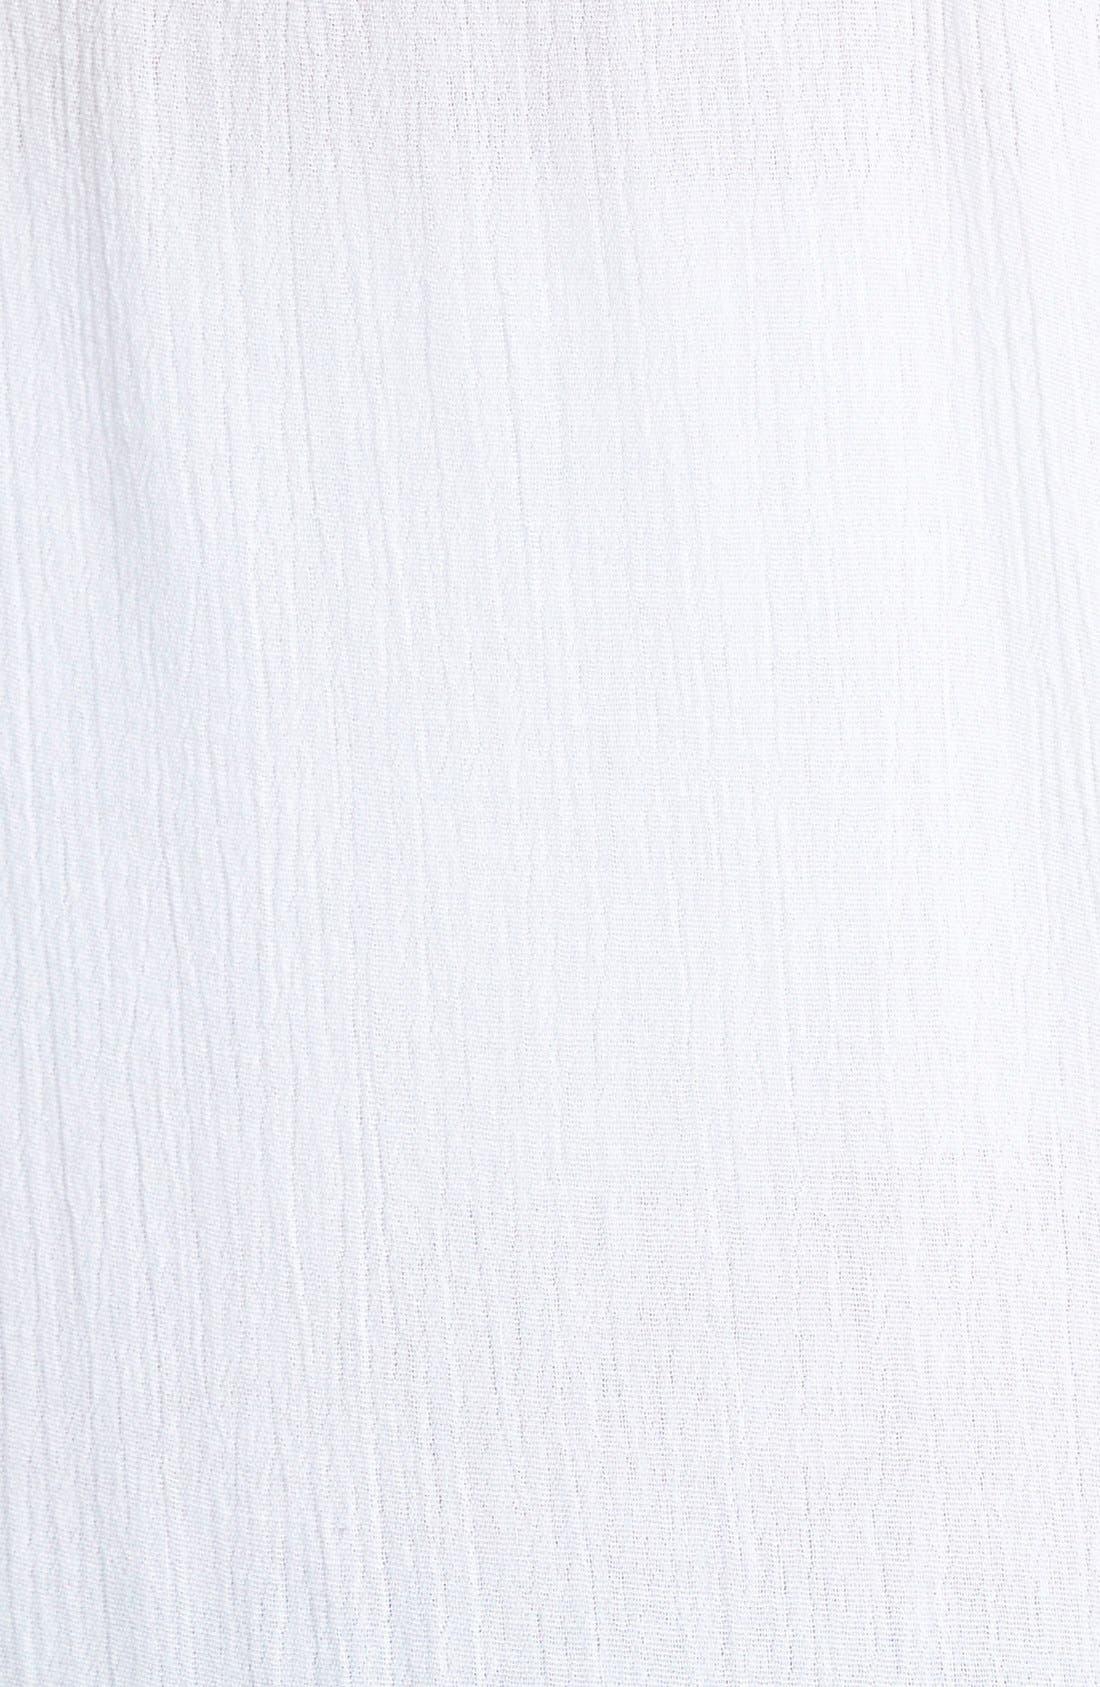 Alternate Image 3  - Sun & Shadow Battenberg Lace Trim Camisole (Juniors)